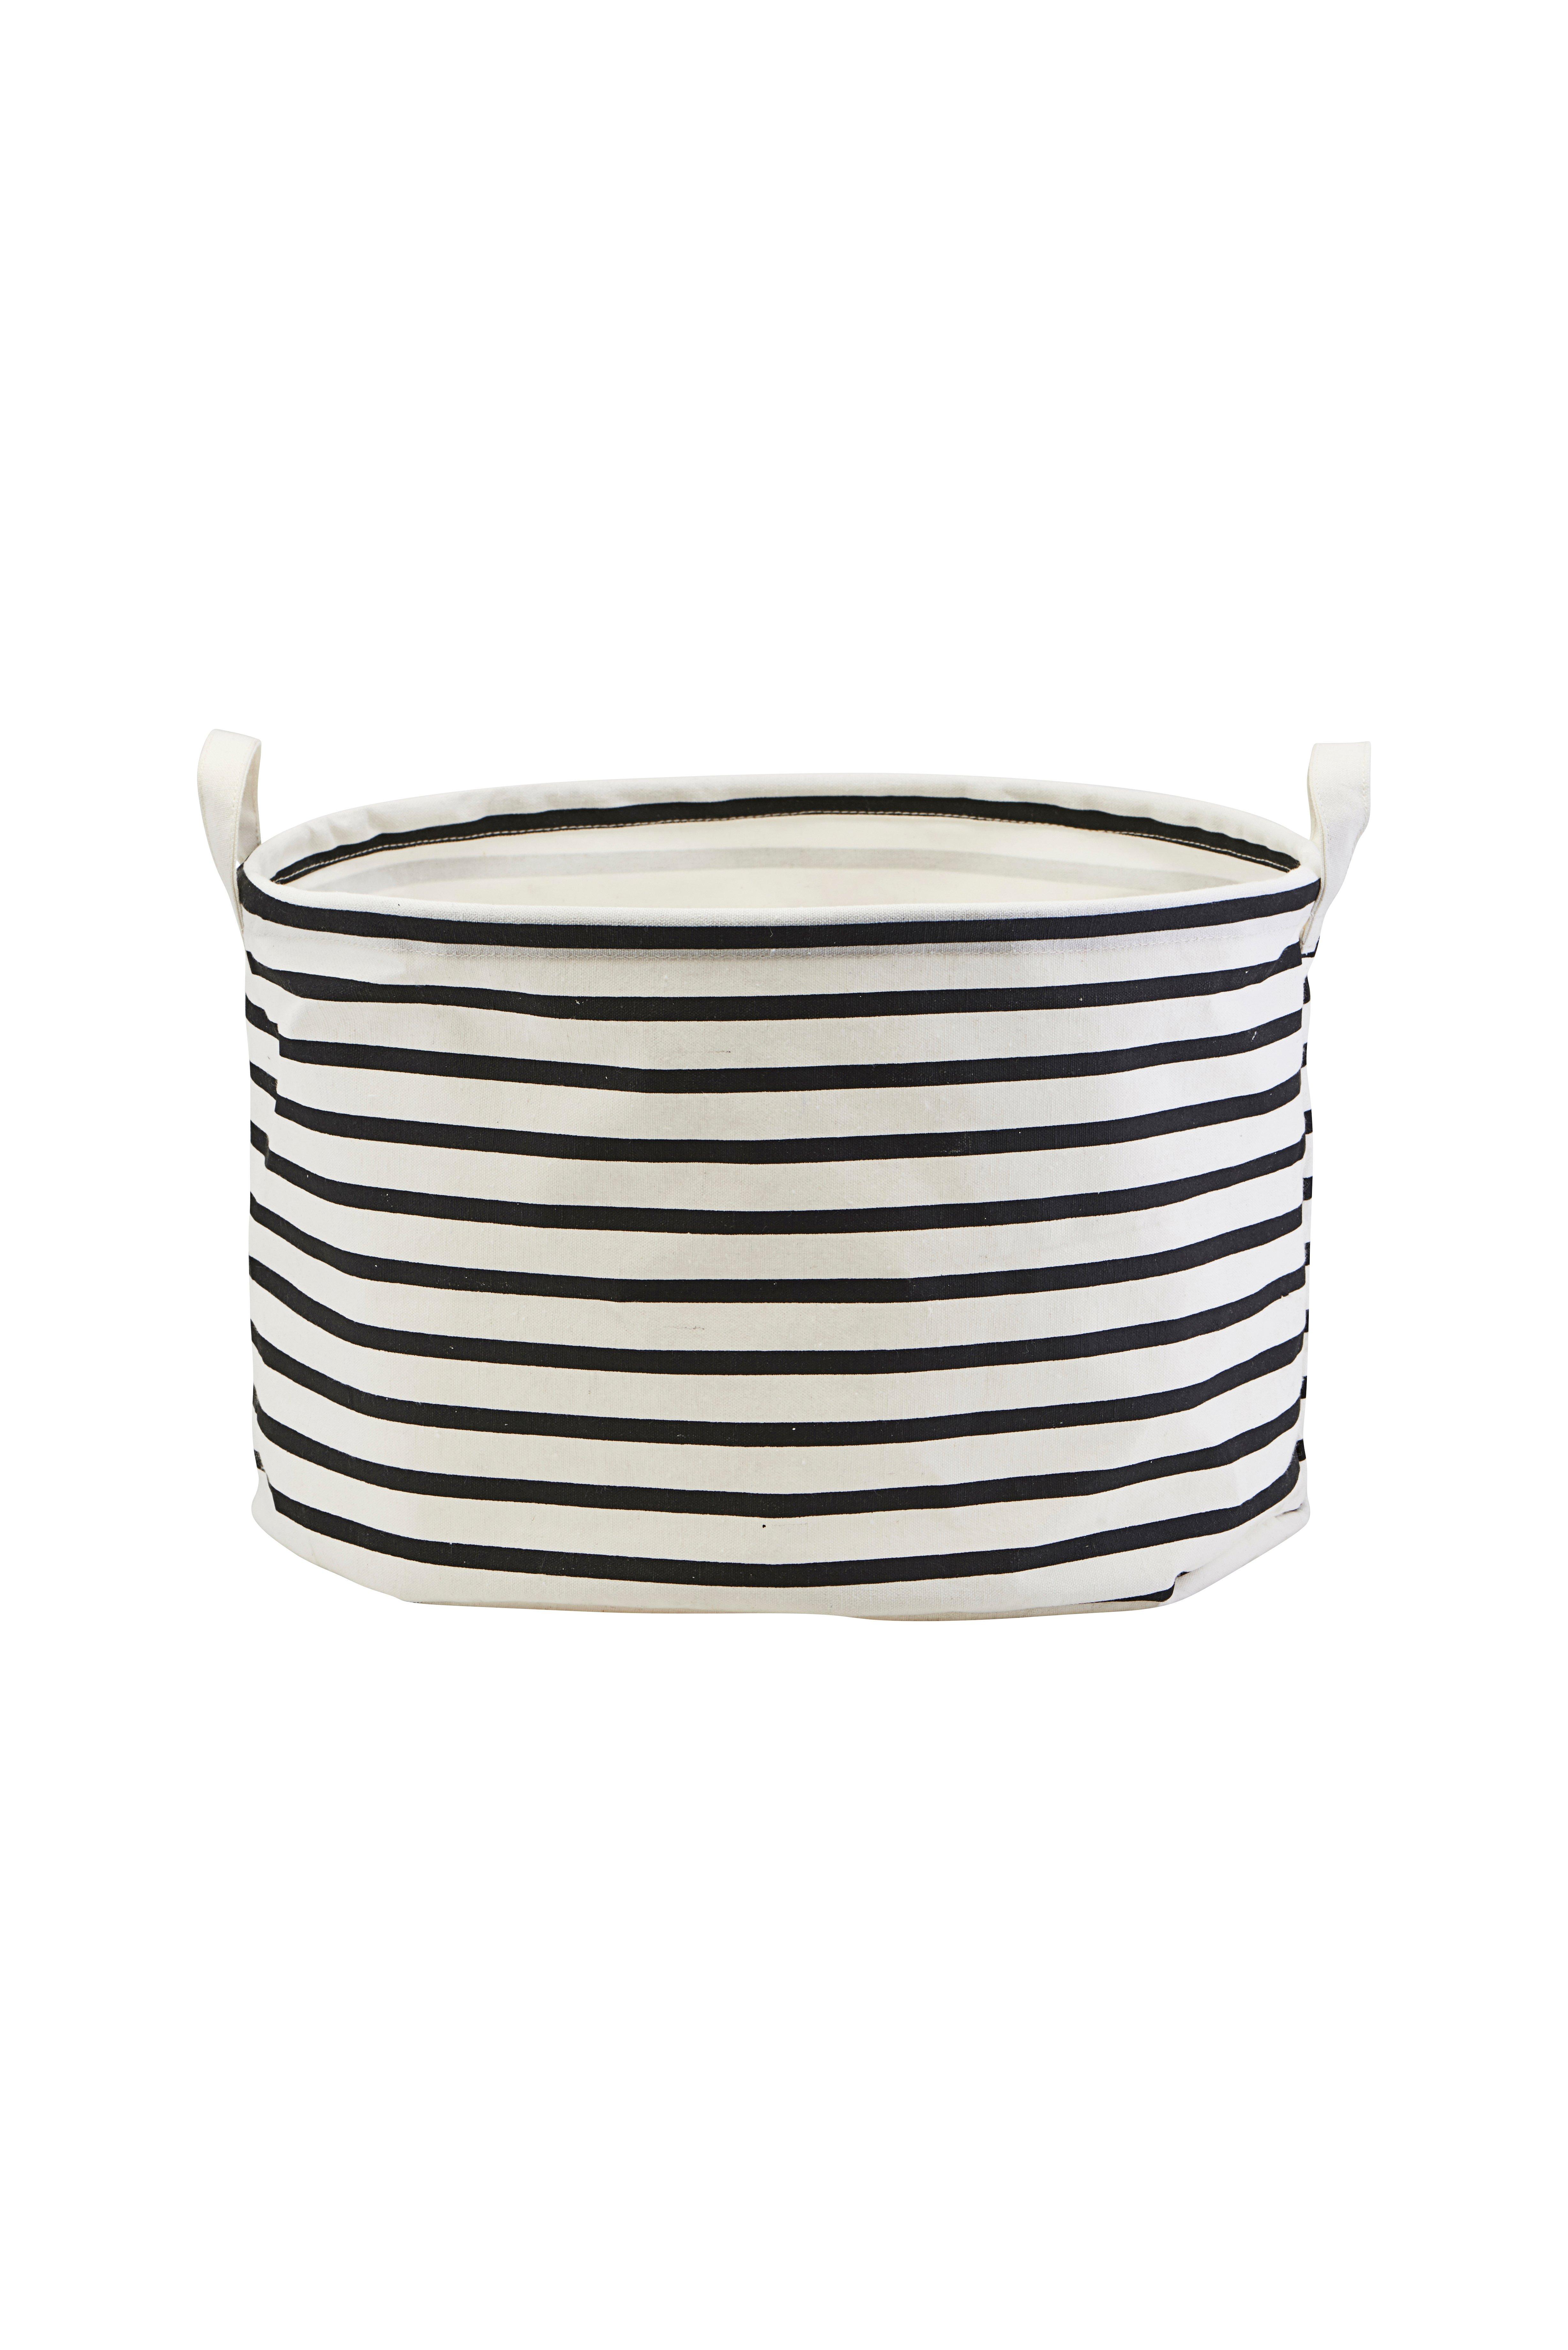 House Doctor - Storage Bag Stripes Small - Black/White (LS0441)